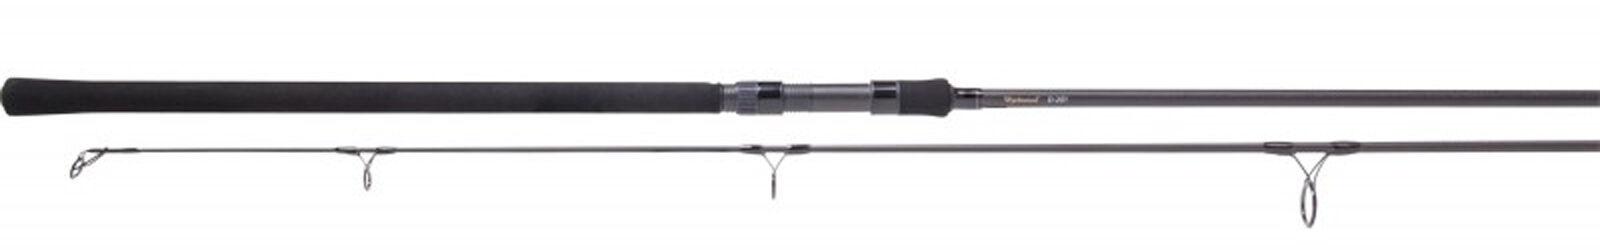 Wychwood Fishing C-201 D-201 12ft 13ft Carp Fishing Wychwood Rod All Test Curves Cork Eva Handles c0d73d